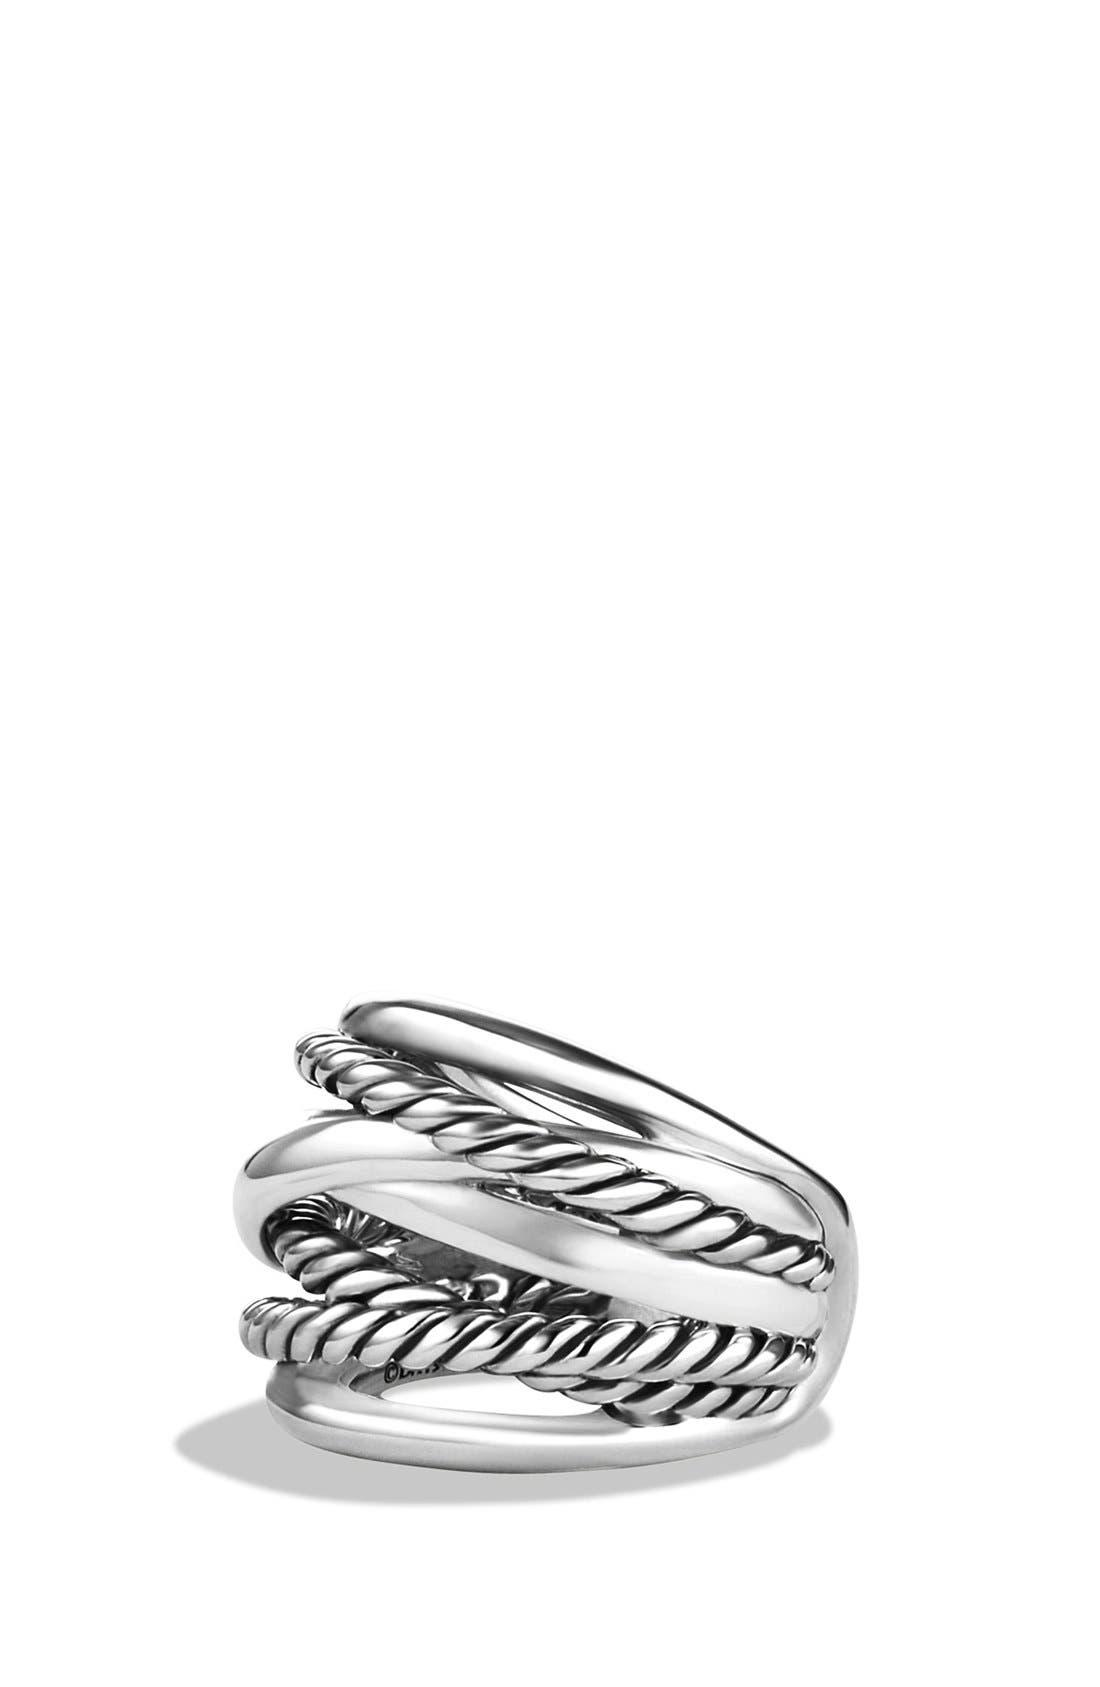 david yurman wide ring